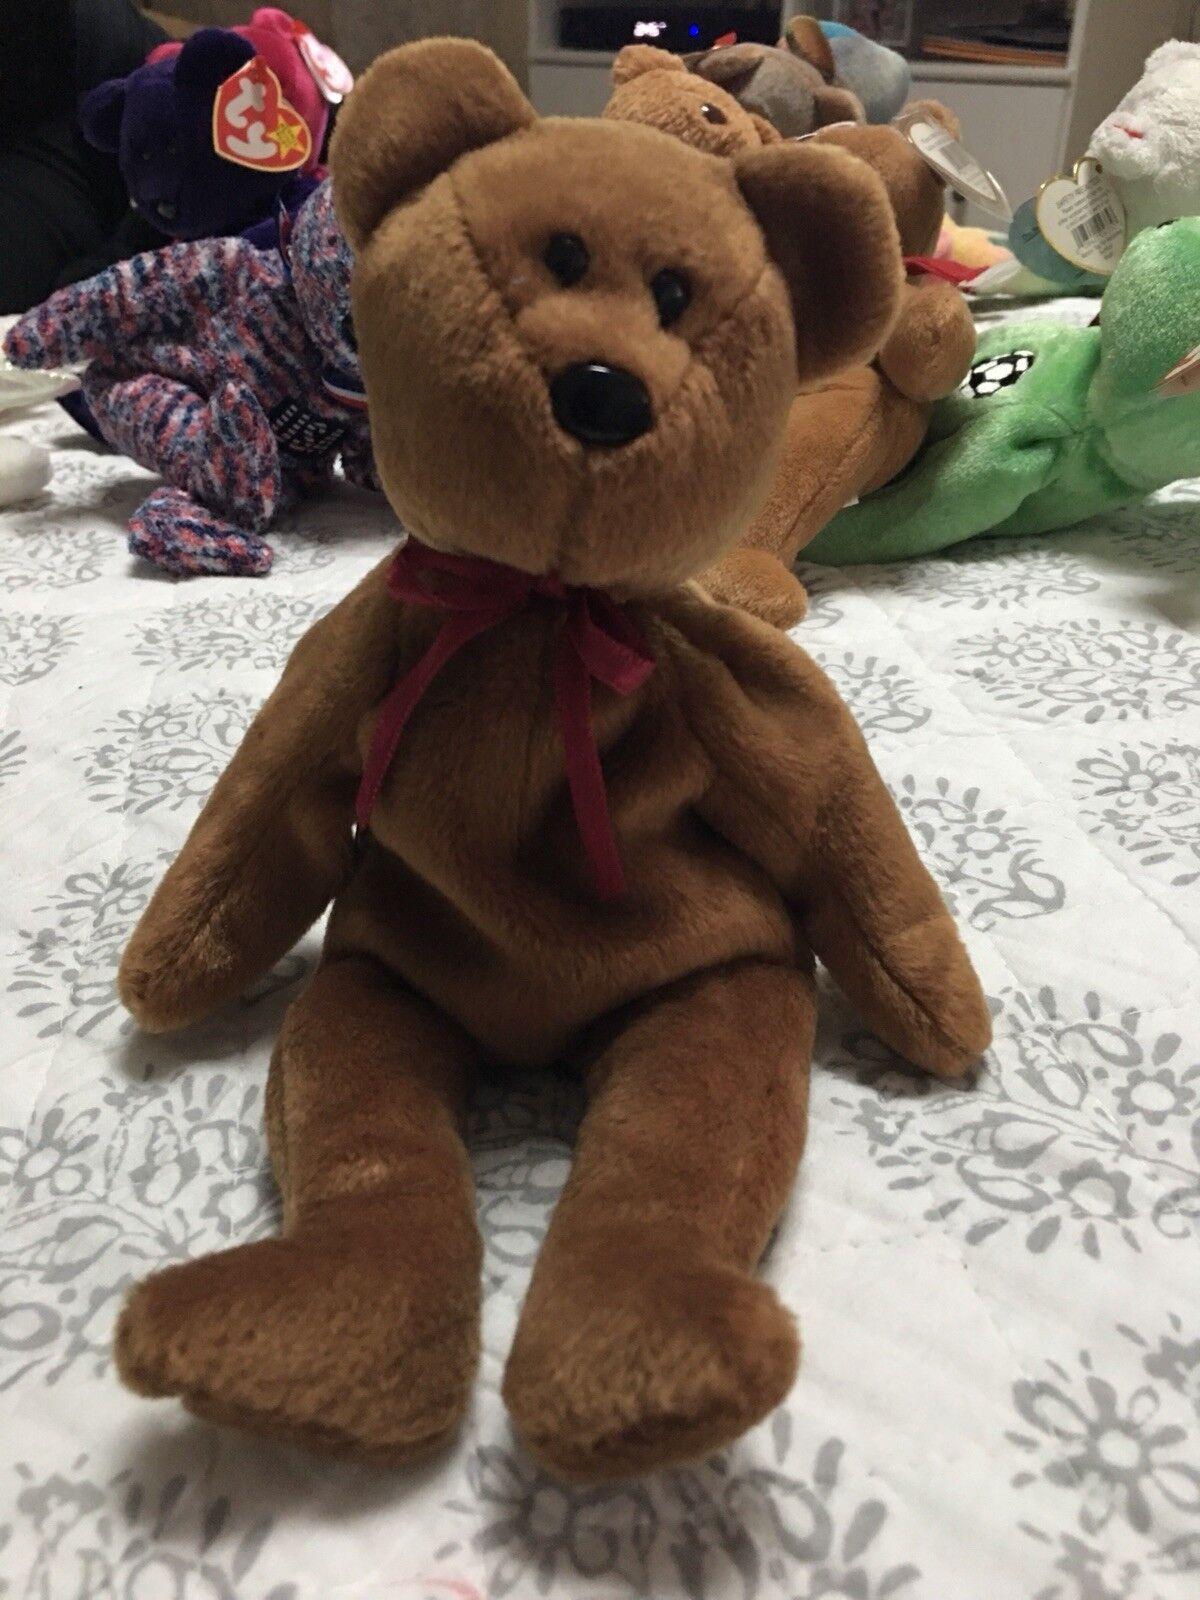 0ddf56687d8 Super Rare 2nd Gen Teddy Brown Bear - Beanie Baby 1993 1st Gen Tush Mint  Face nqrdbh1594-Toys   Hobbies